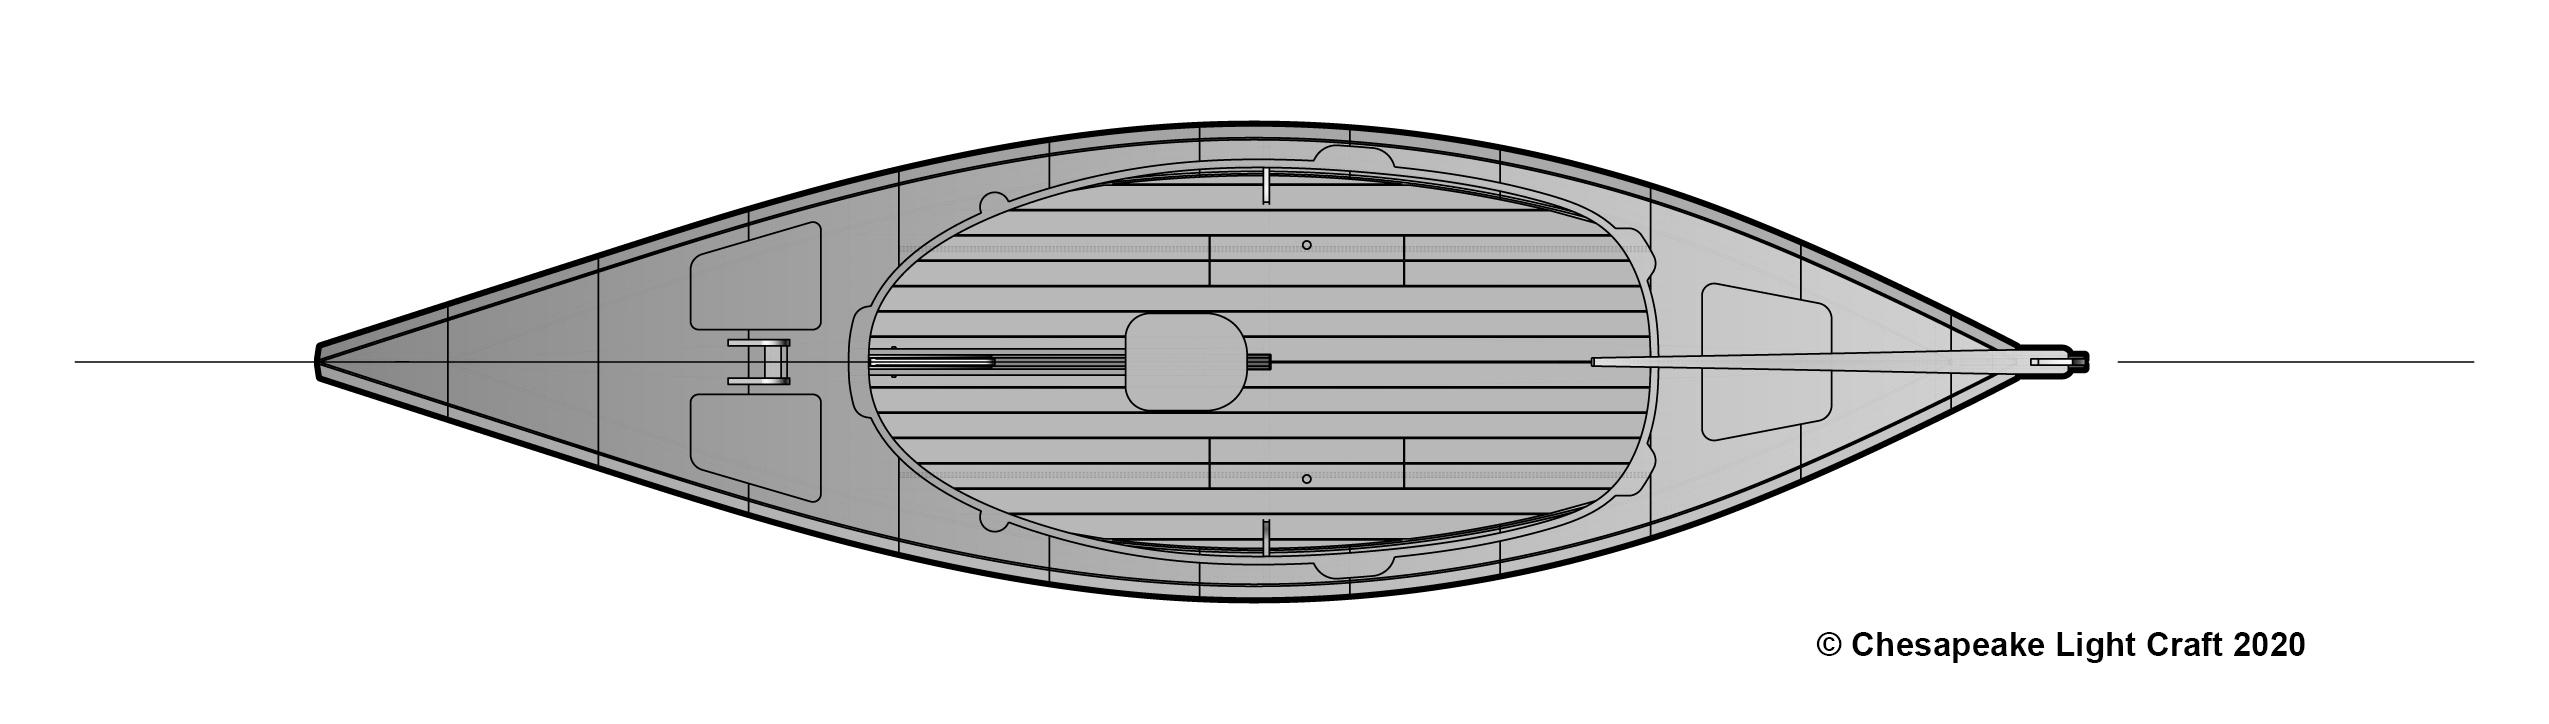 CLC Camp-Cruiser Sharpie